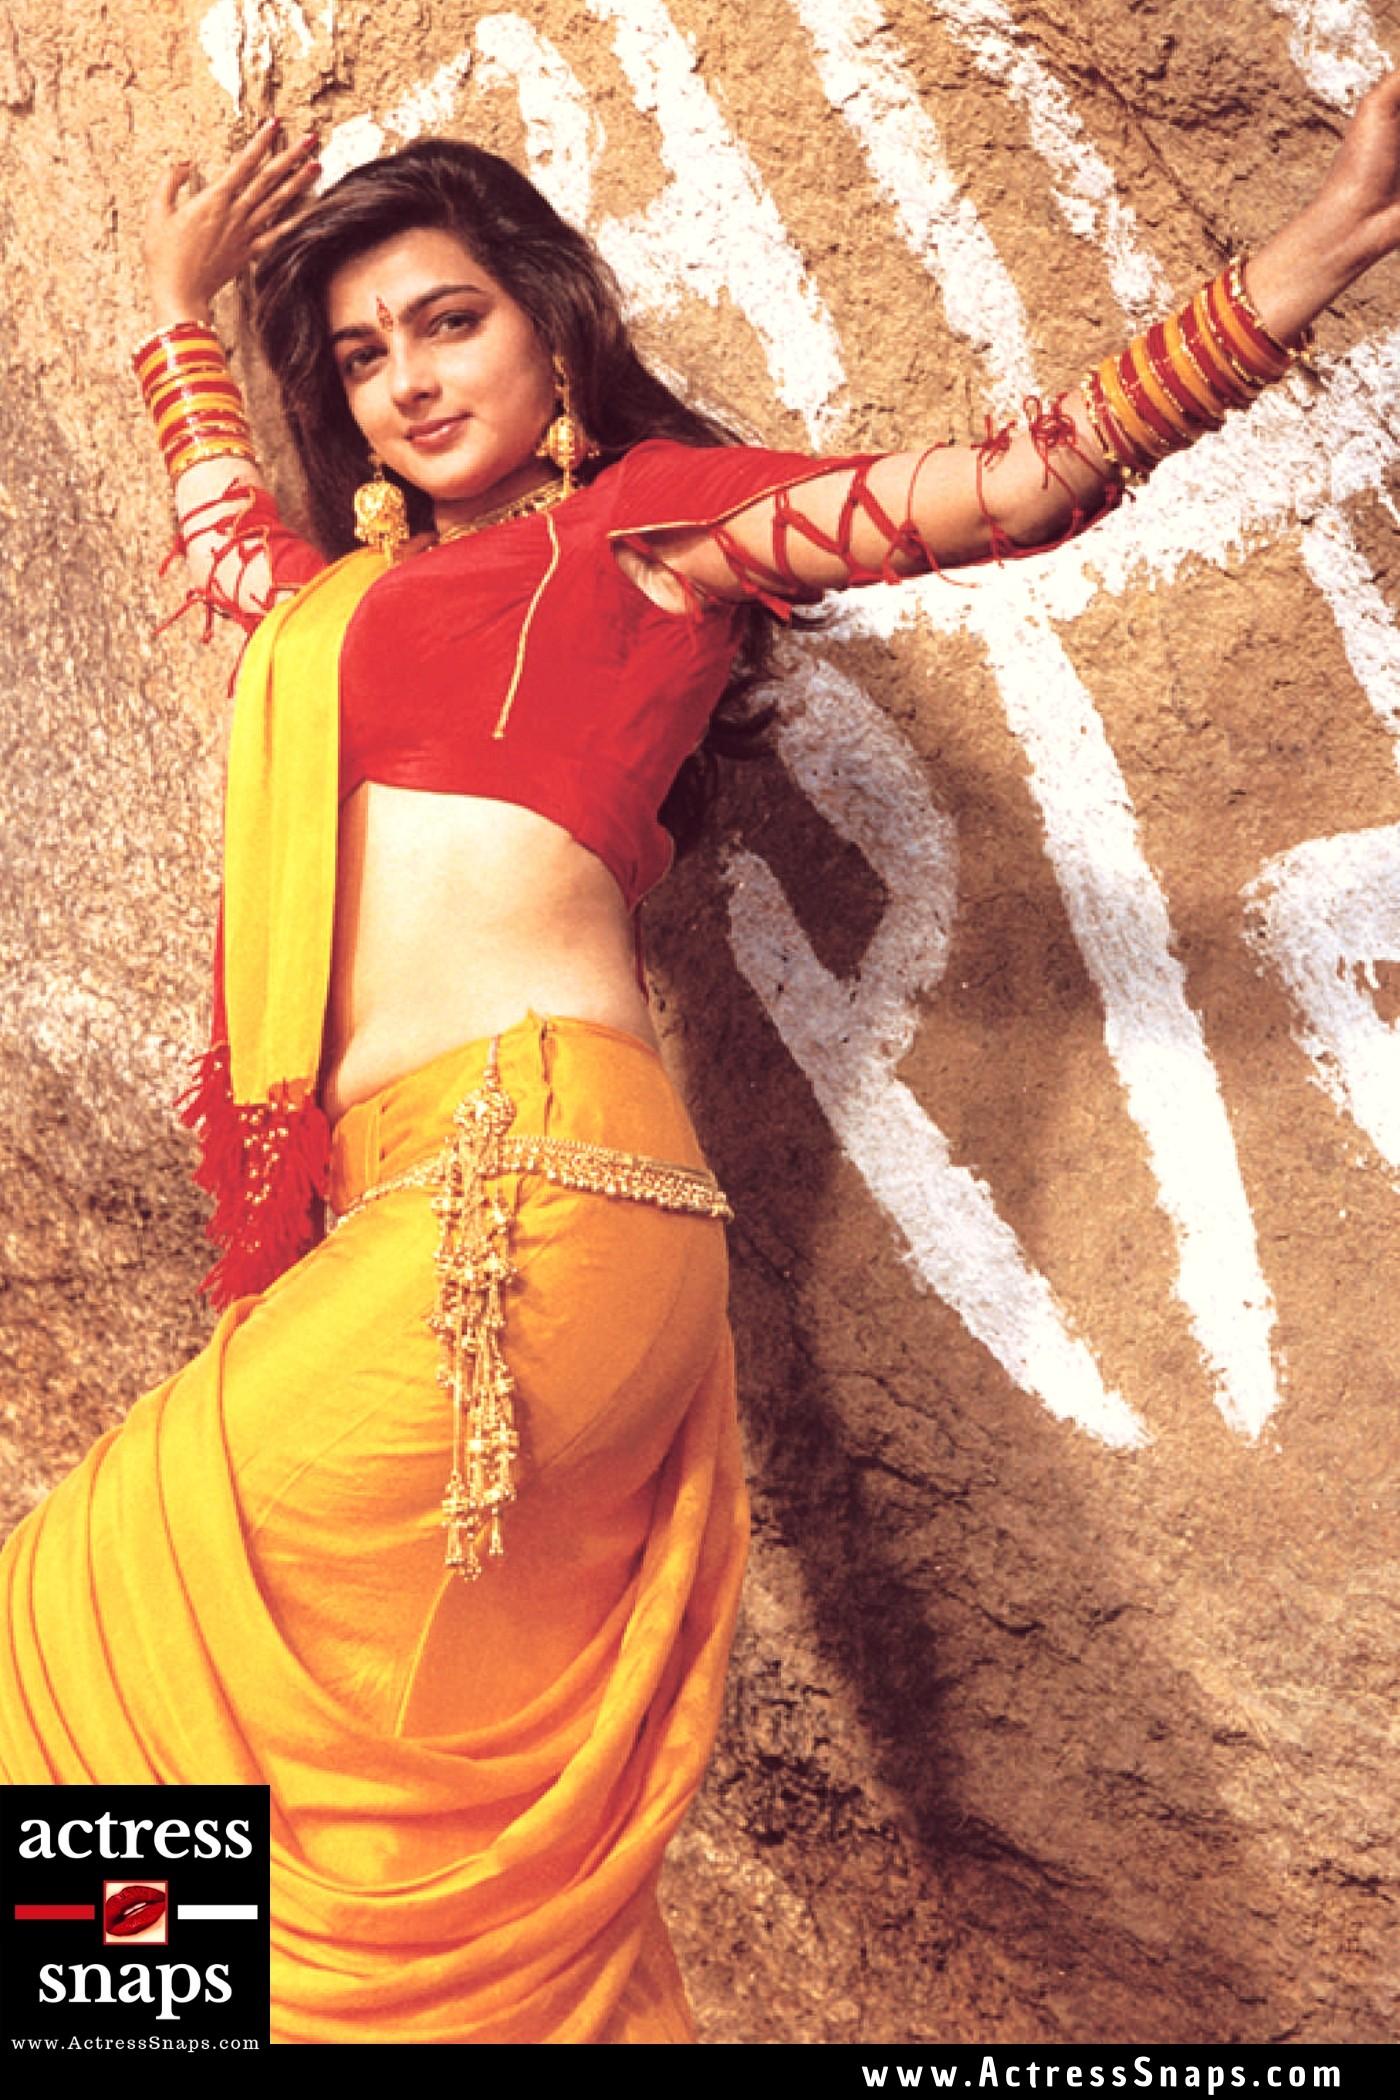 Sexy Mamta Kulkarni Photos and GIFs - Sexy Actress Pictures | Hot Actress Pictures - ActressSnaps.com